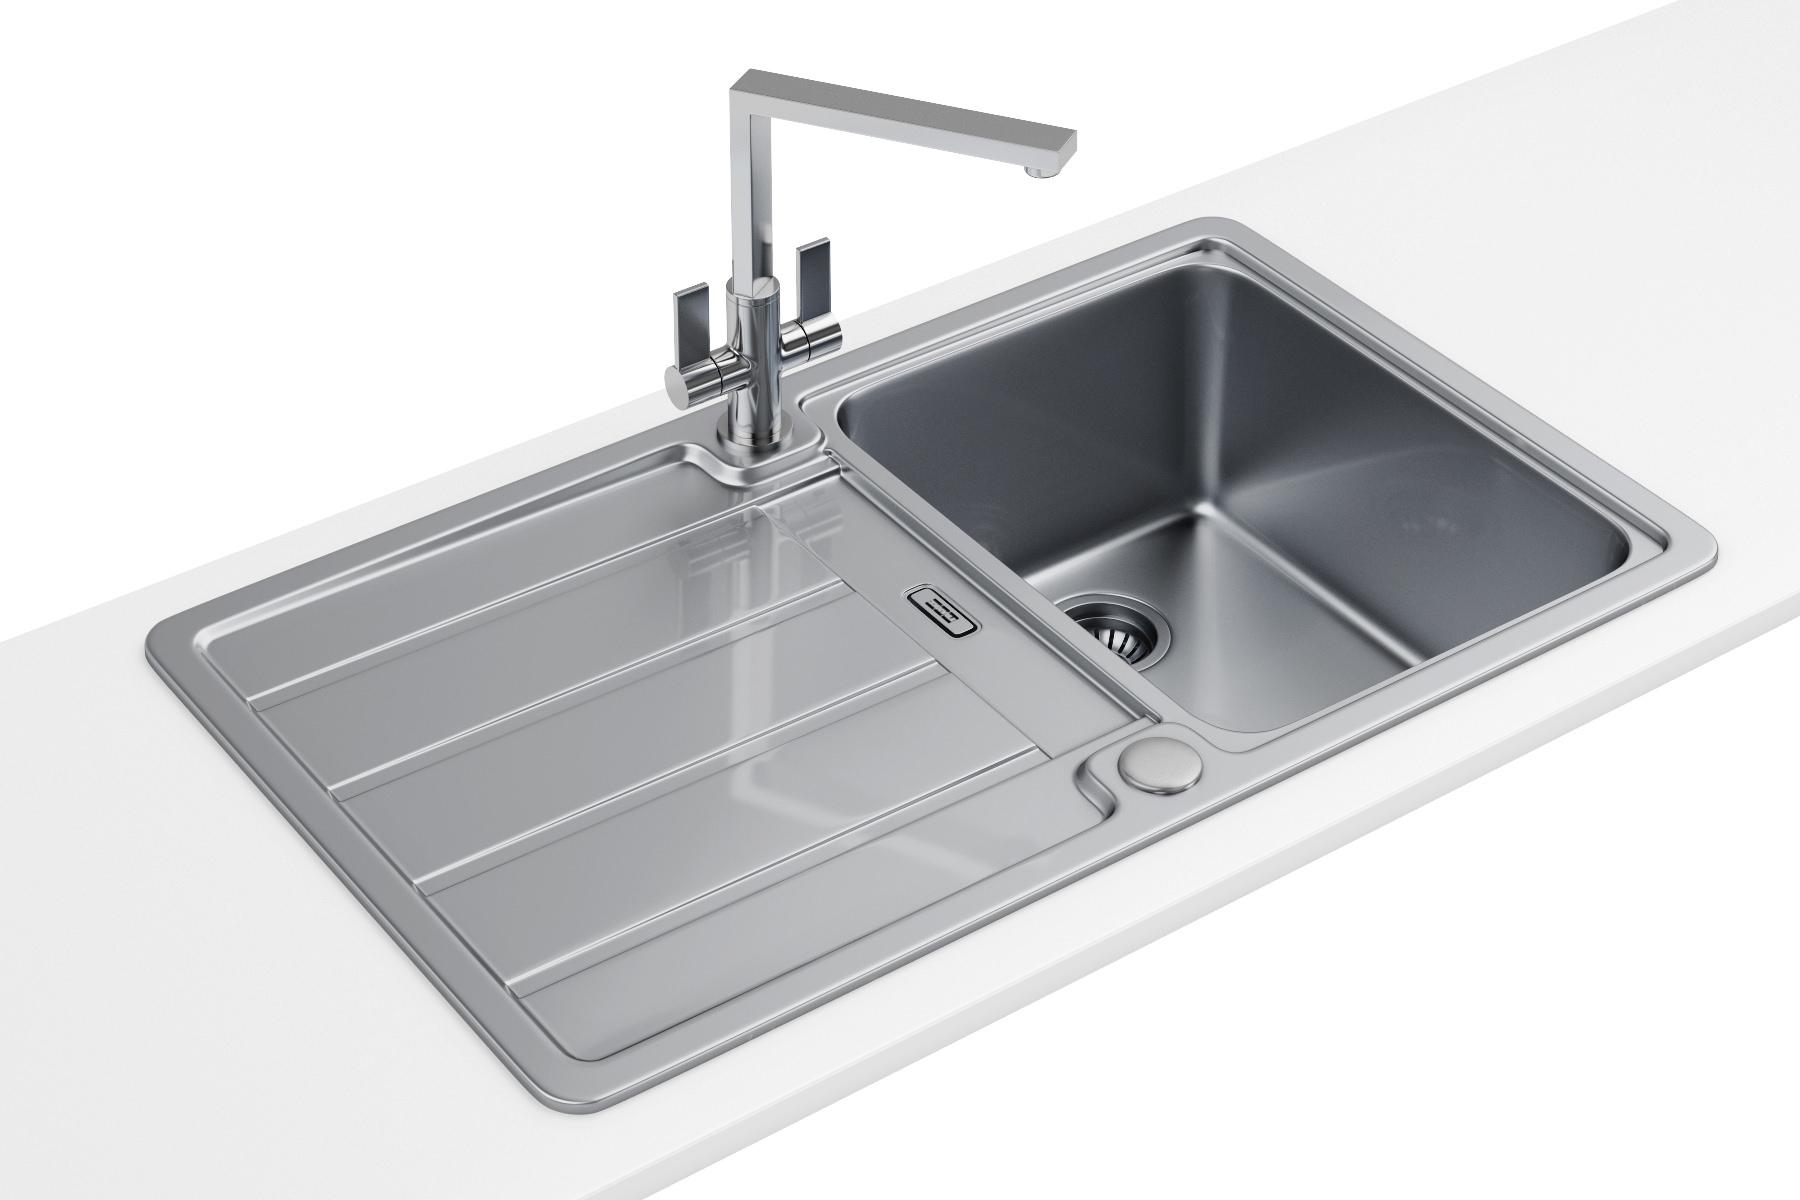 Franke Hydros HDX 614 Stainless Steel 10 Bowl Kitchen Inset Sink 1010314563 BOM